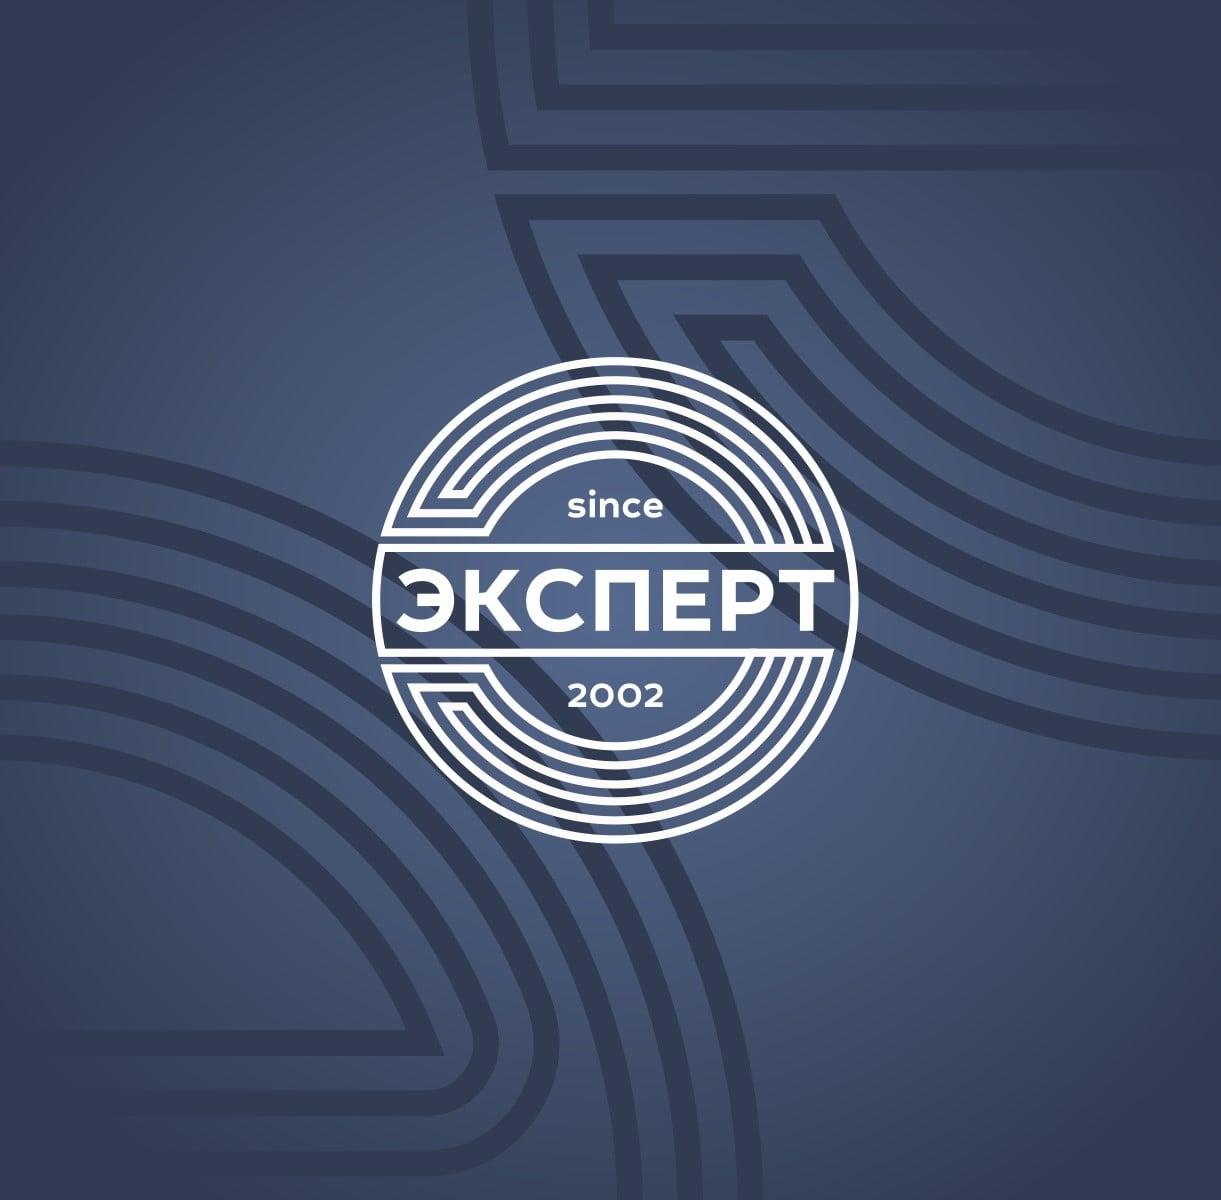 ООО Центр экспертизы условий труда «Эксперт»